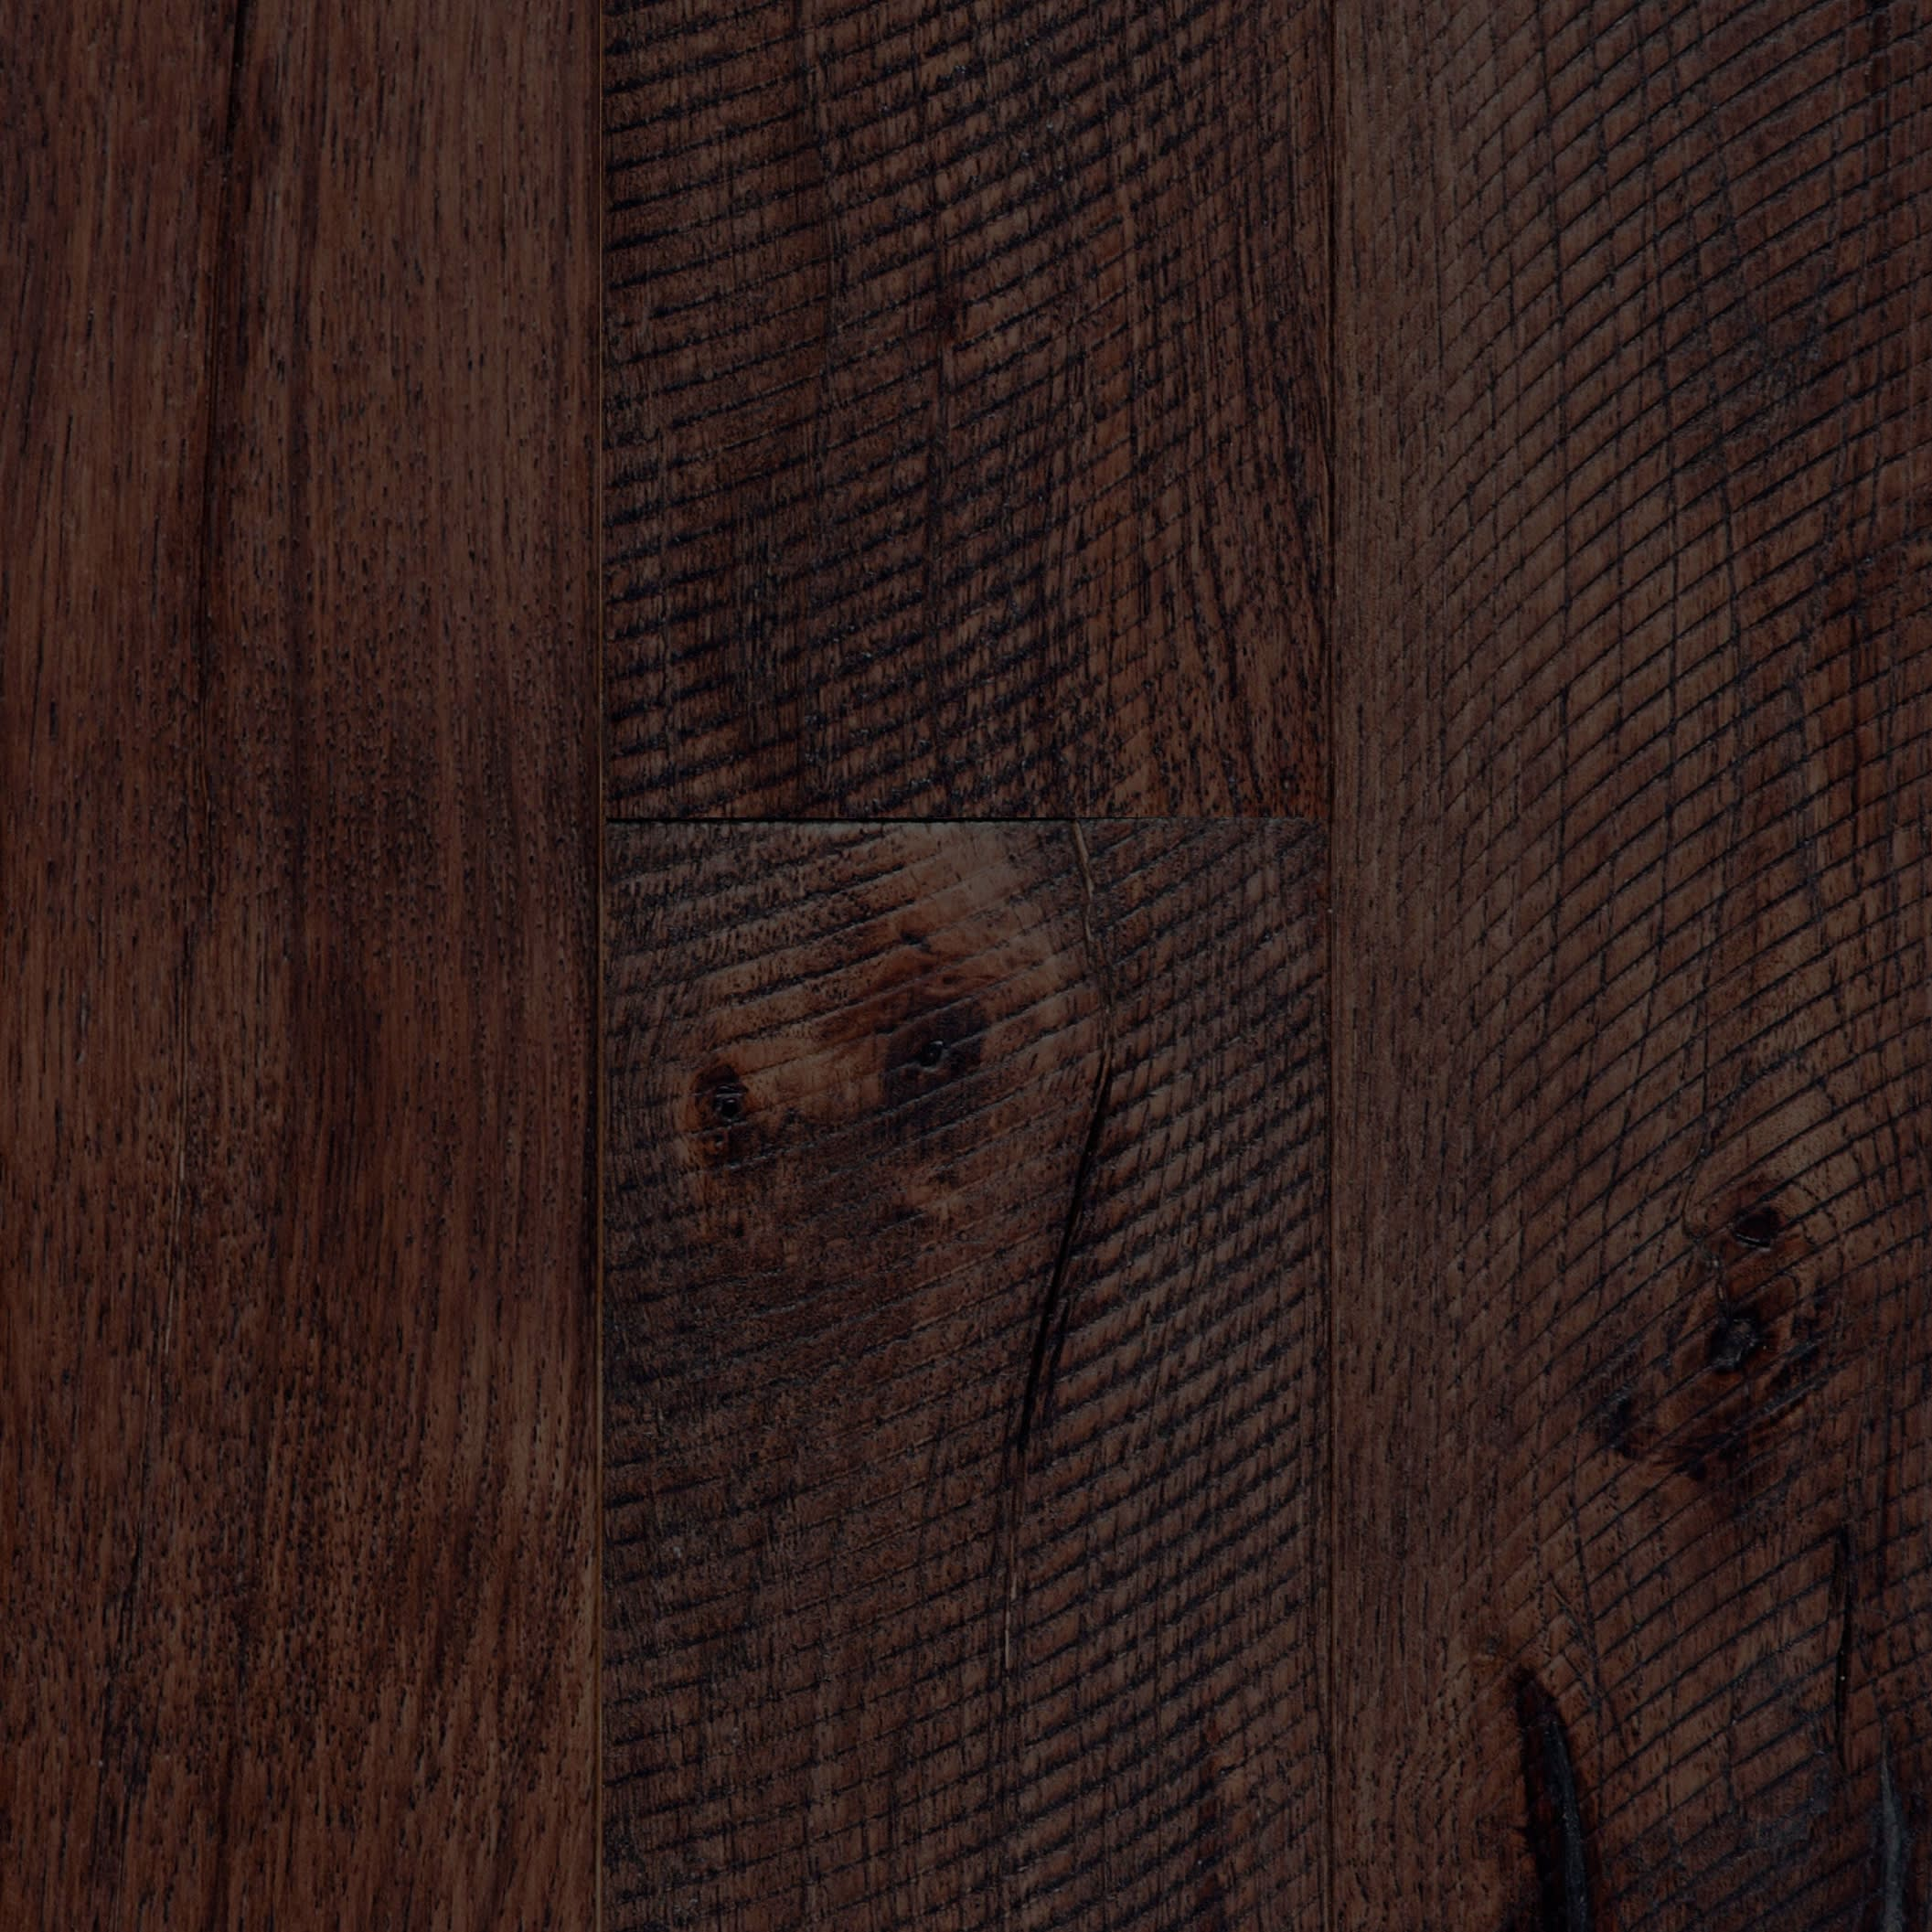 Belmont Hickory Distressed Engineered Hardwood Flooring